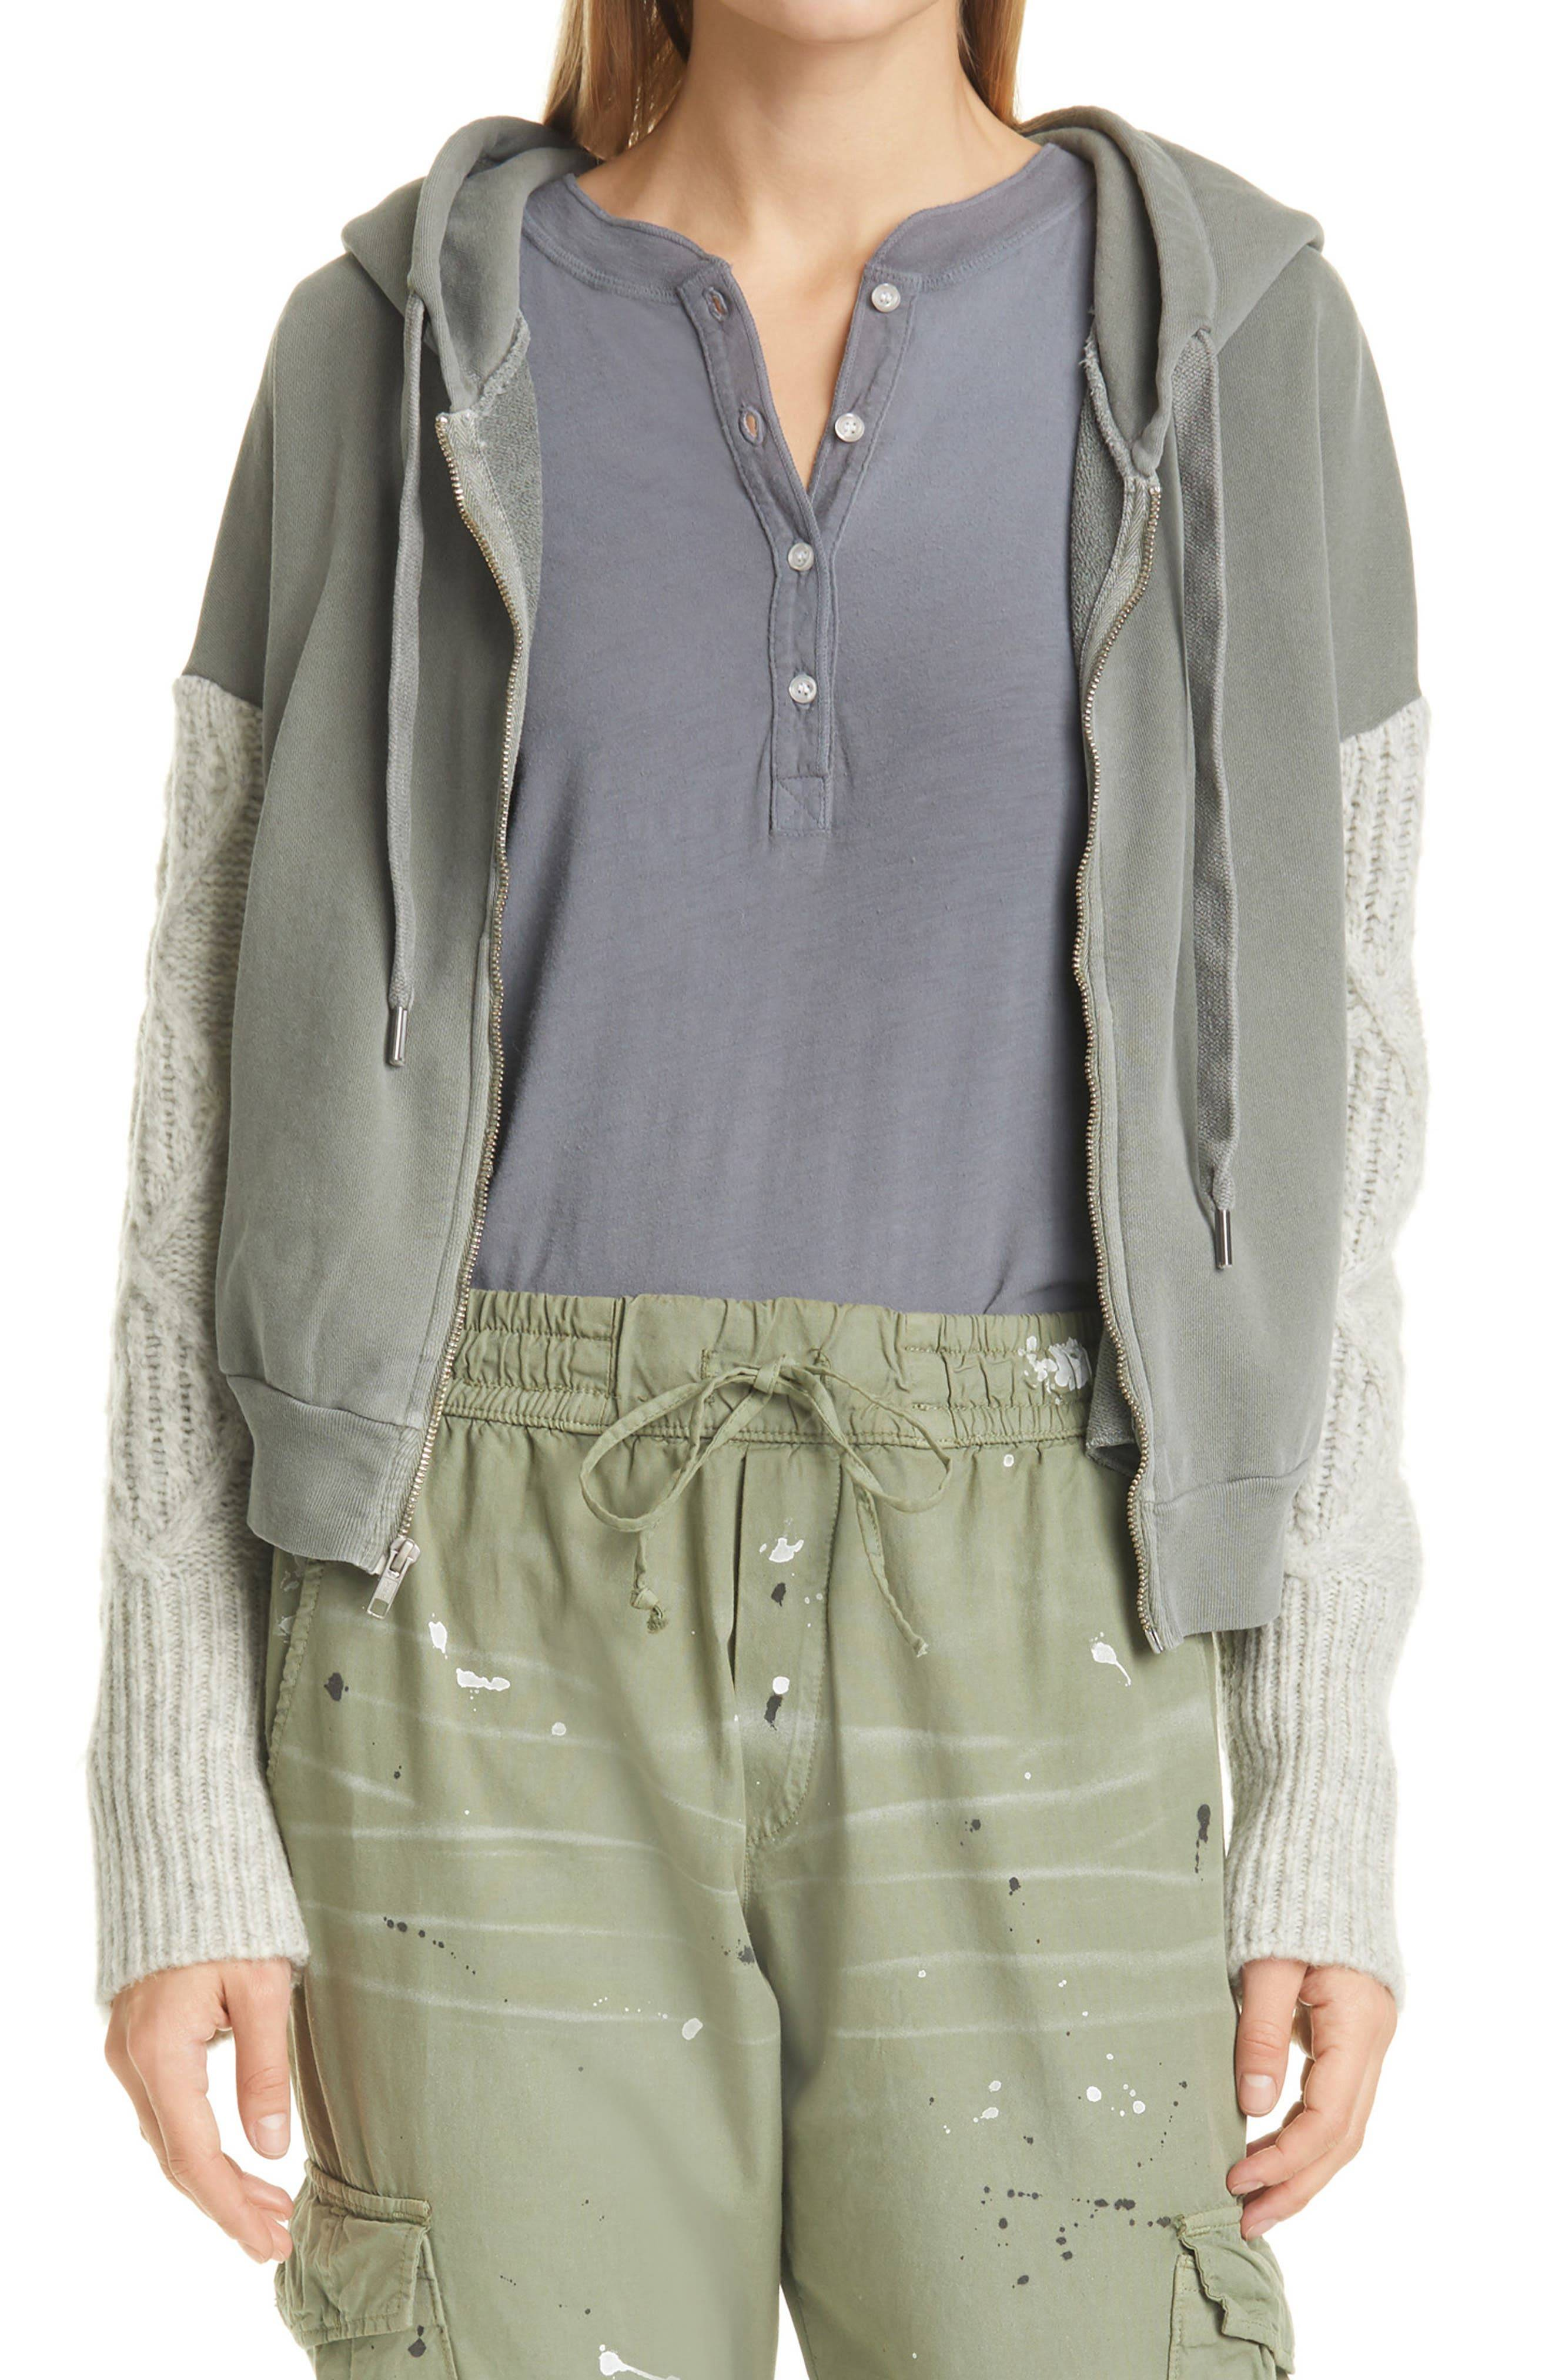 NSF Clothing Women's Nsf Clothing Farrel Women's Zip Hoodie, Size Medium - Grey